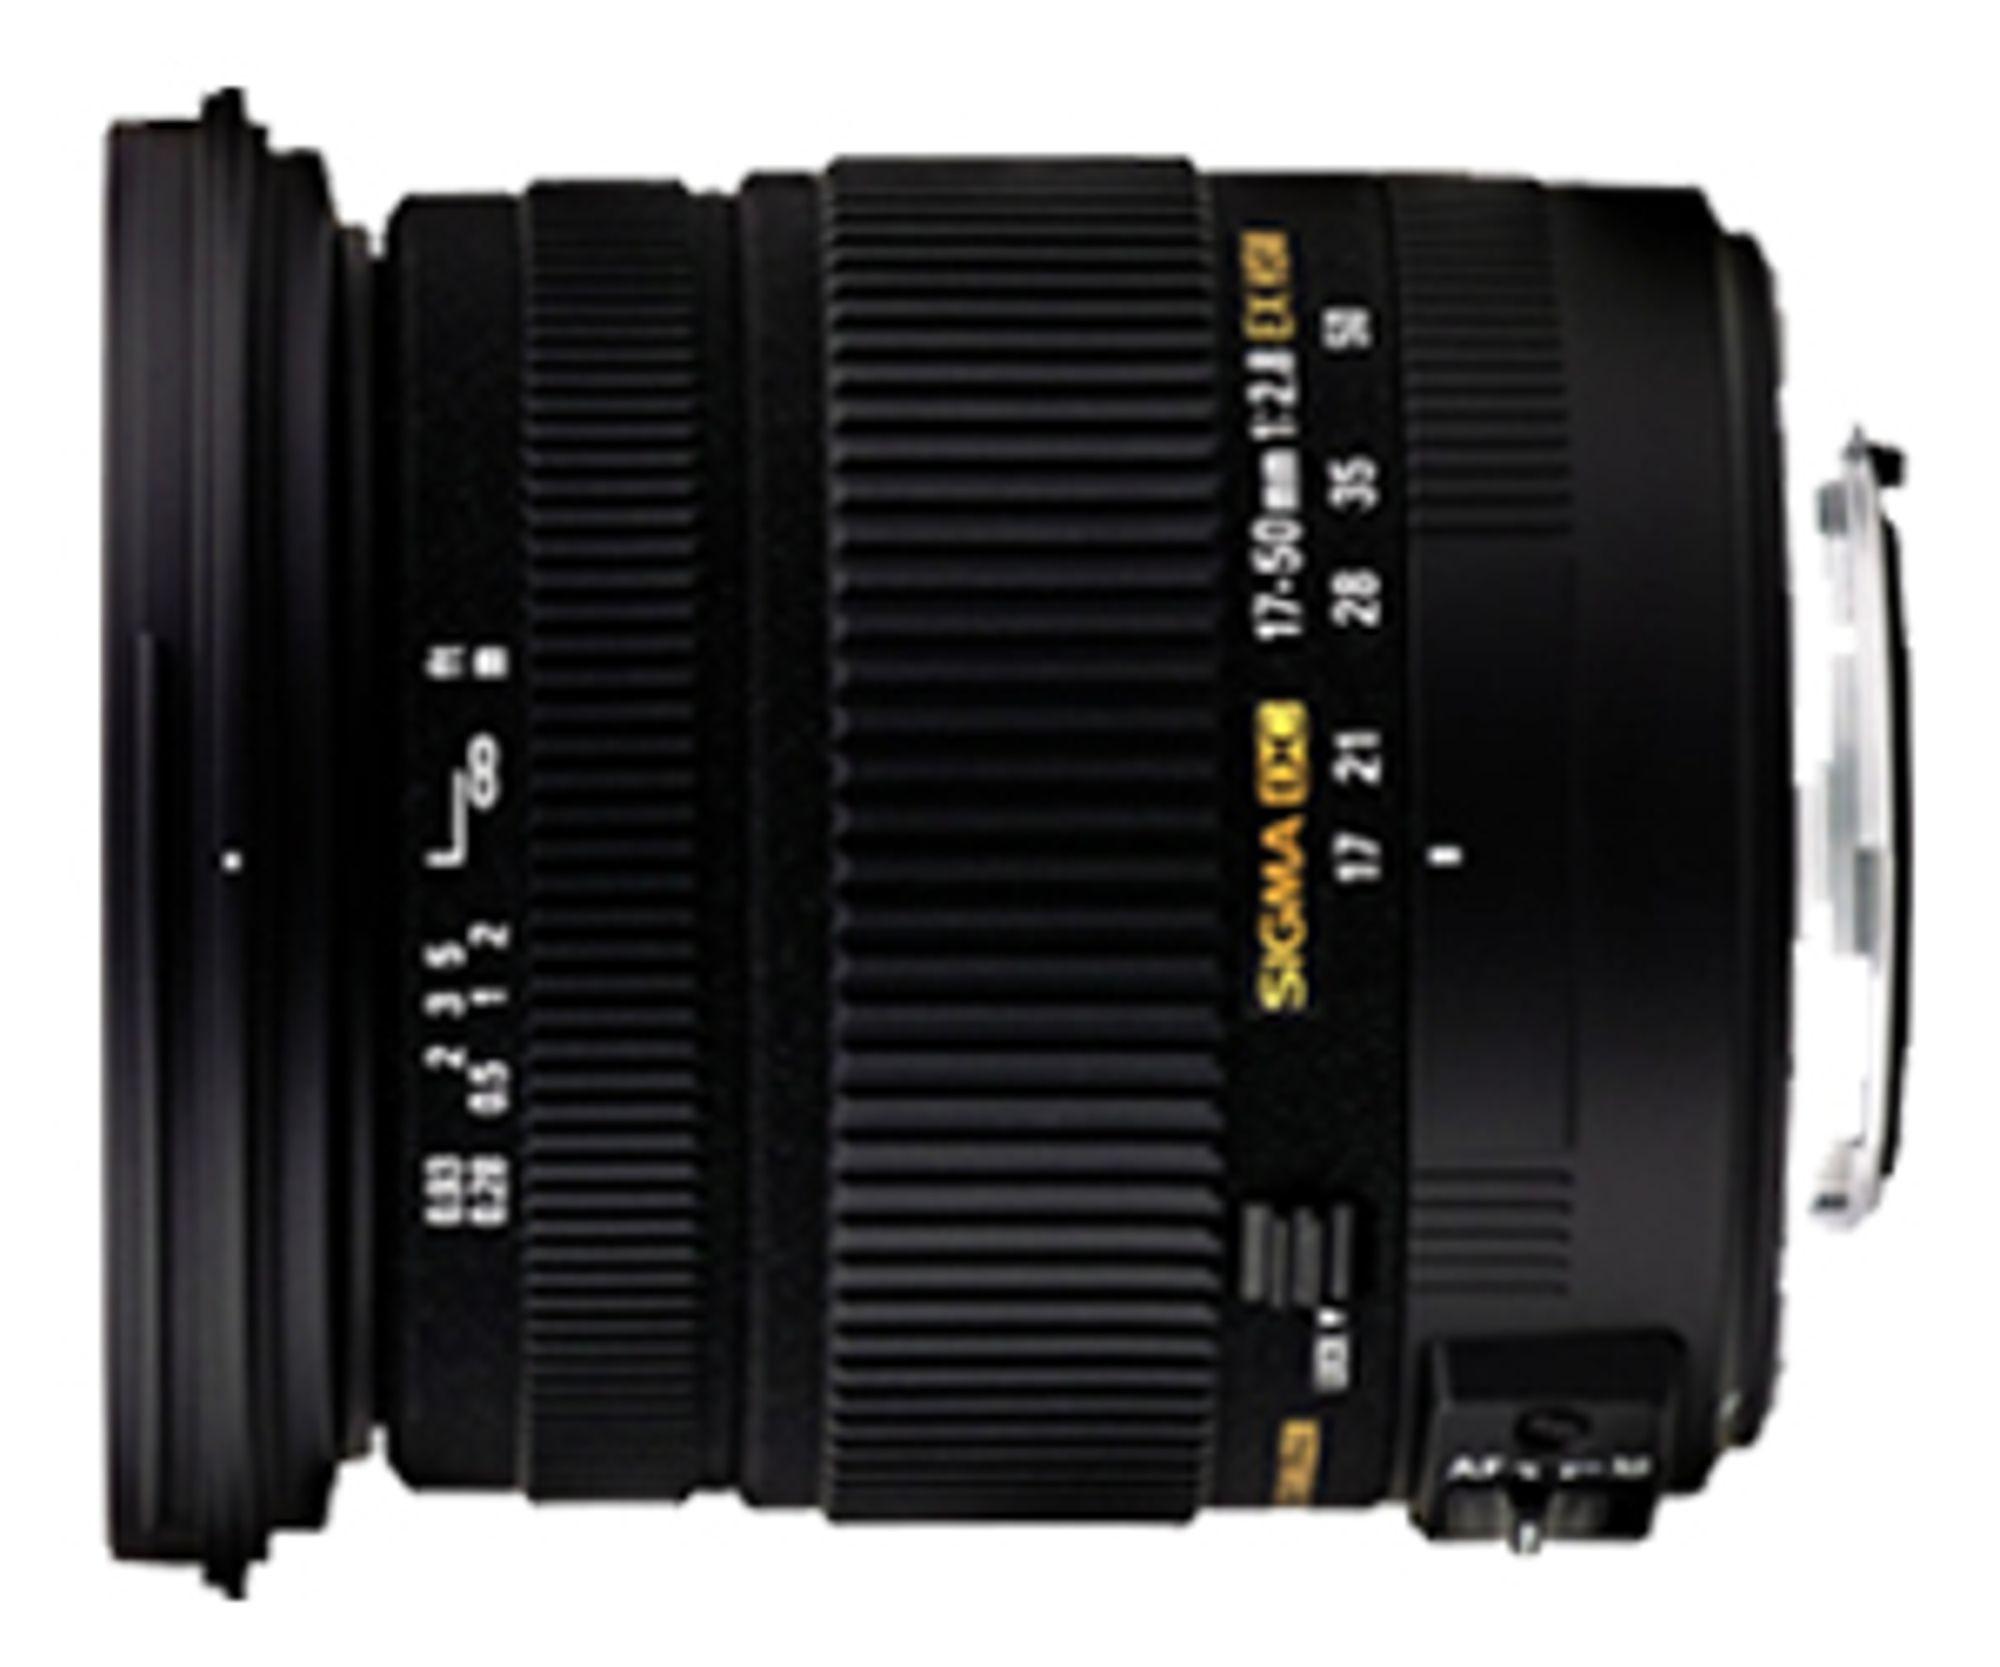 Sigma 17-50 mm F2.8 EX DG OS HSM.